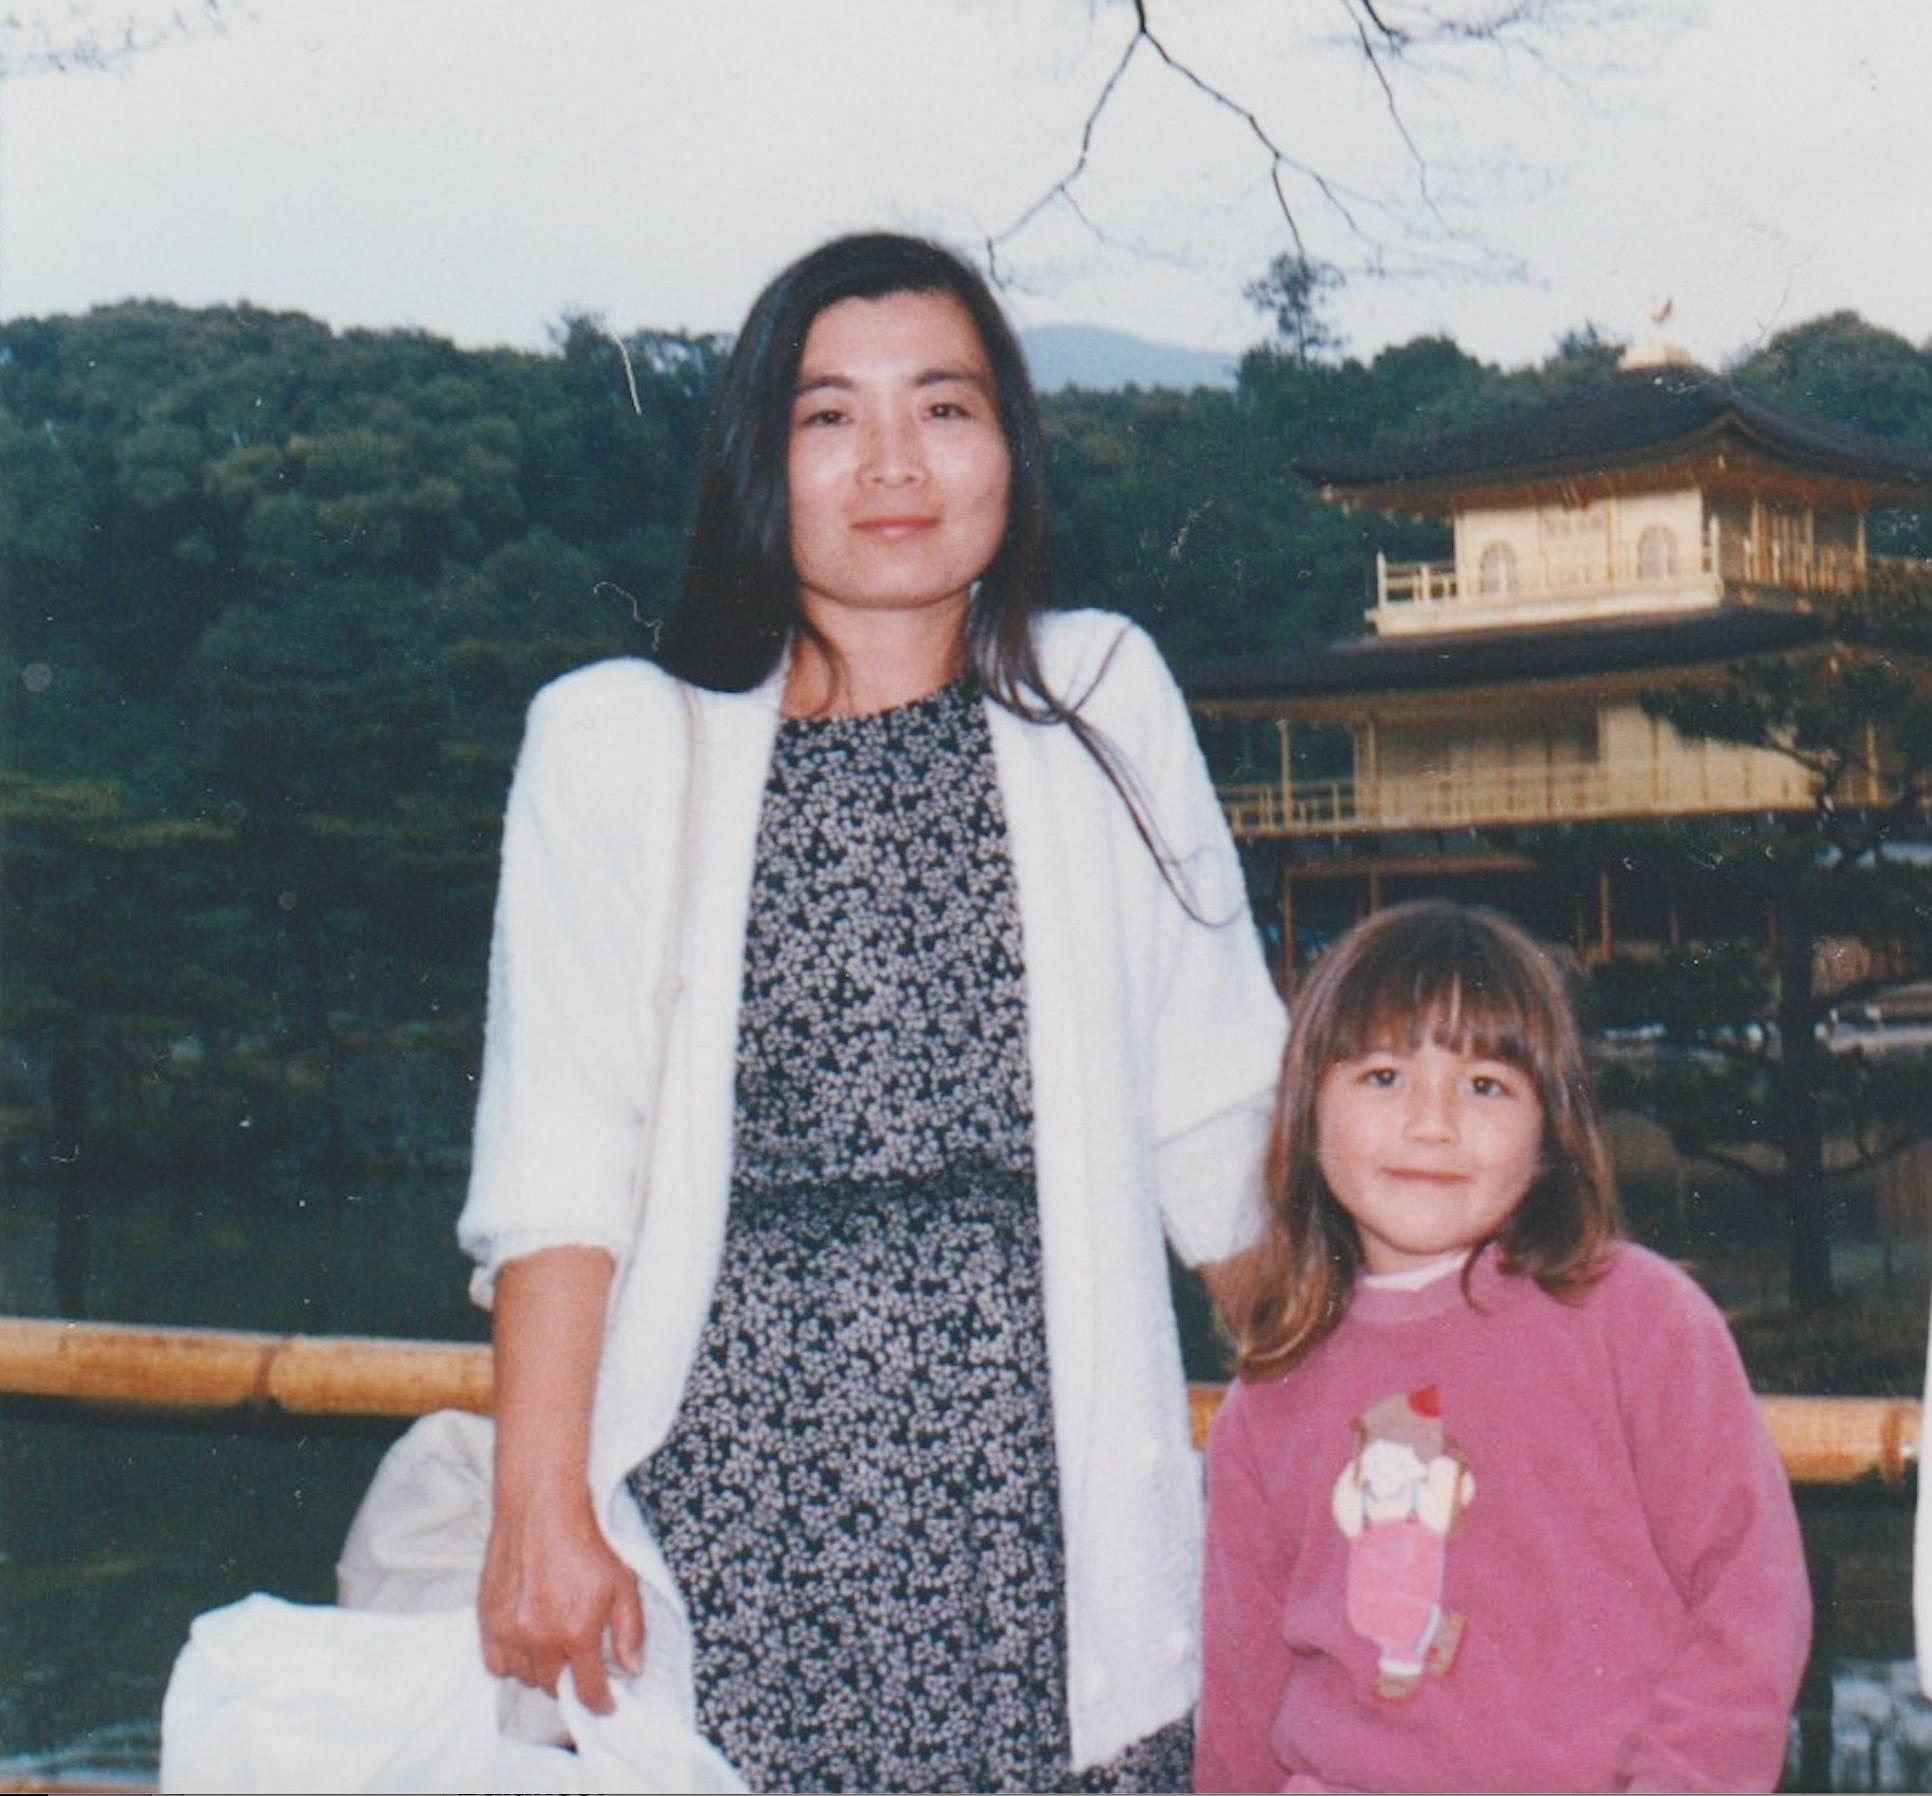 candice kumai and her mom